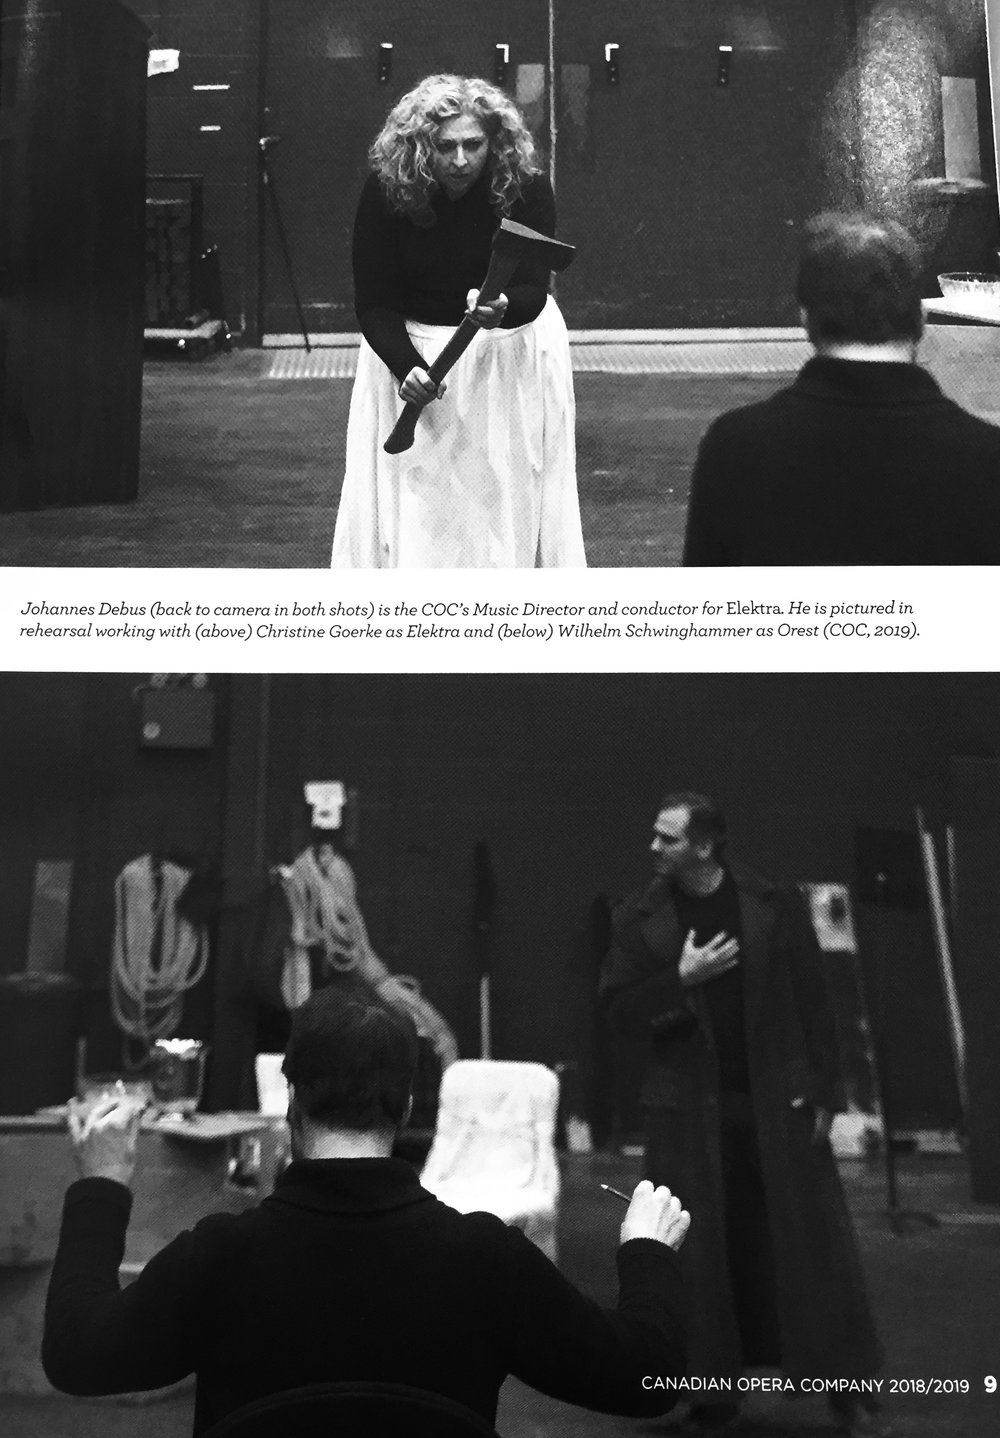 photo credit: Canadian Opera Company